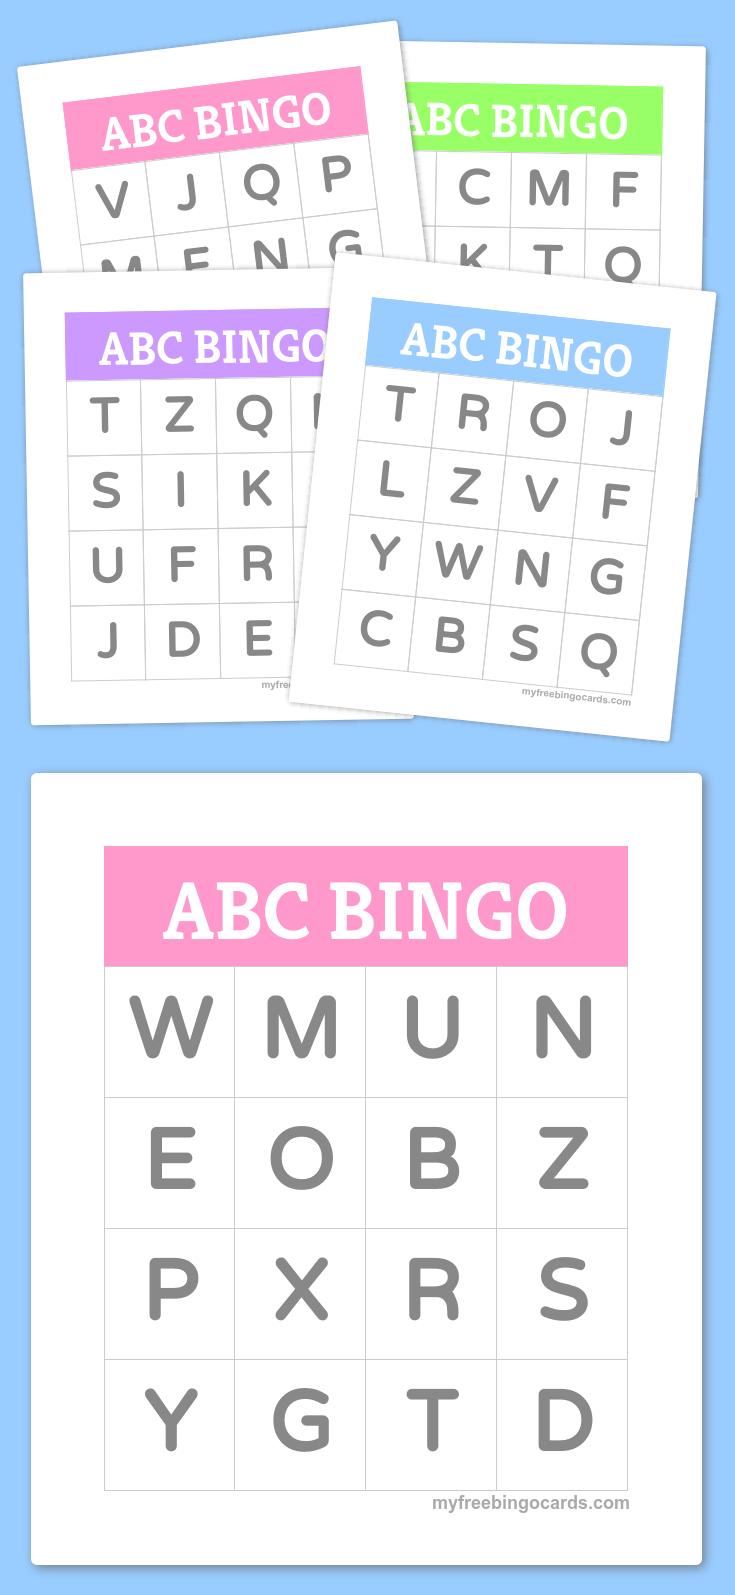 Free Printable Bingo Cards | Letters | Pinterest | Preschool - Free Printable Spanish Bingo Cards